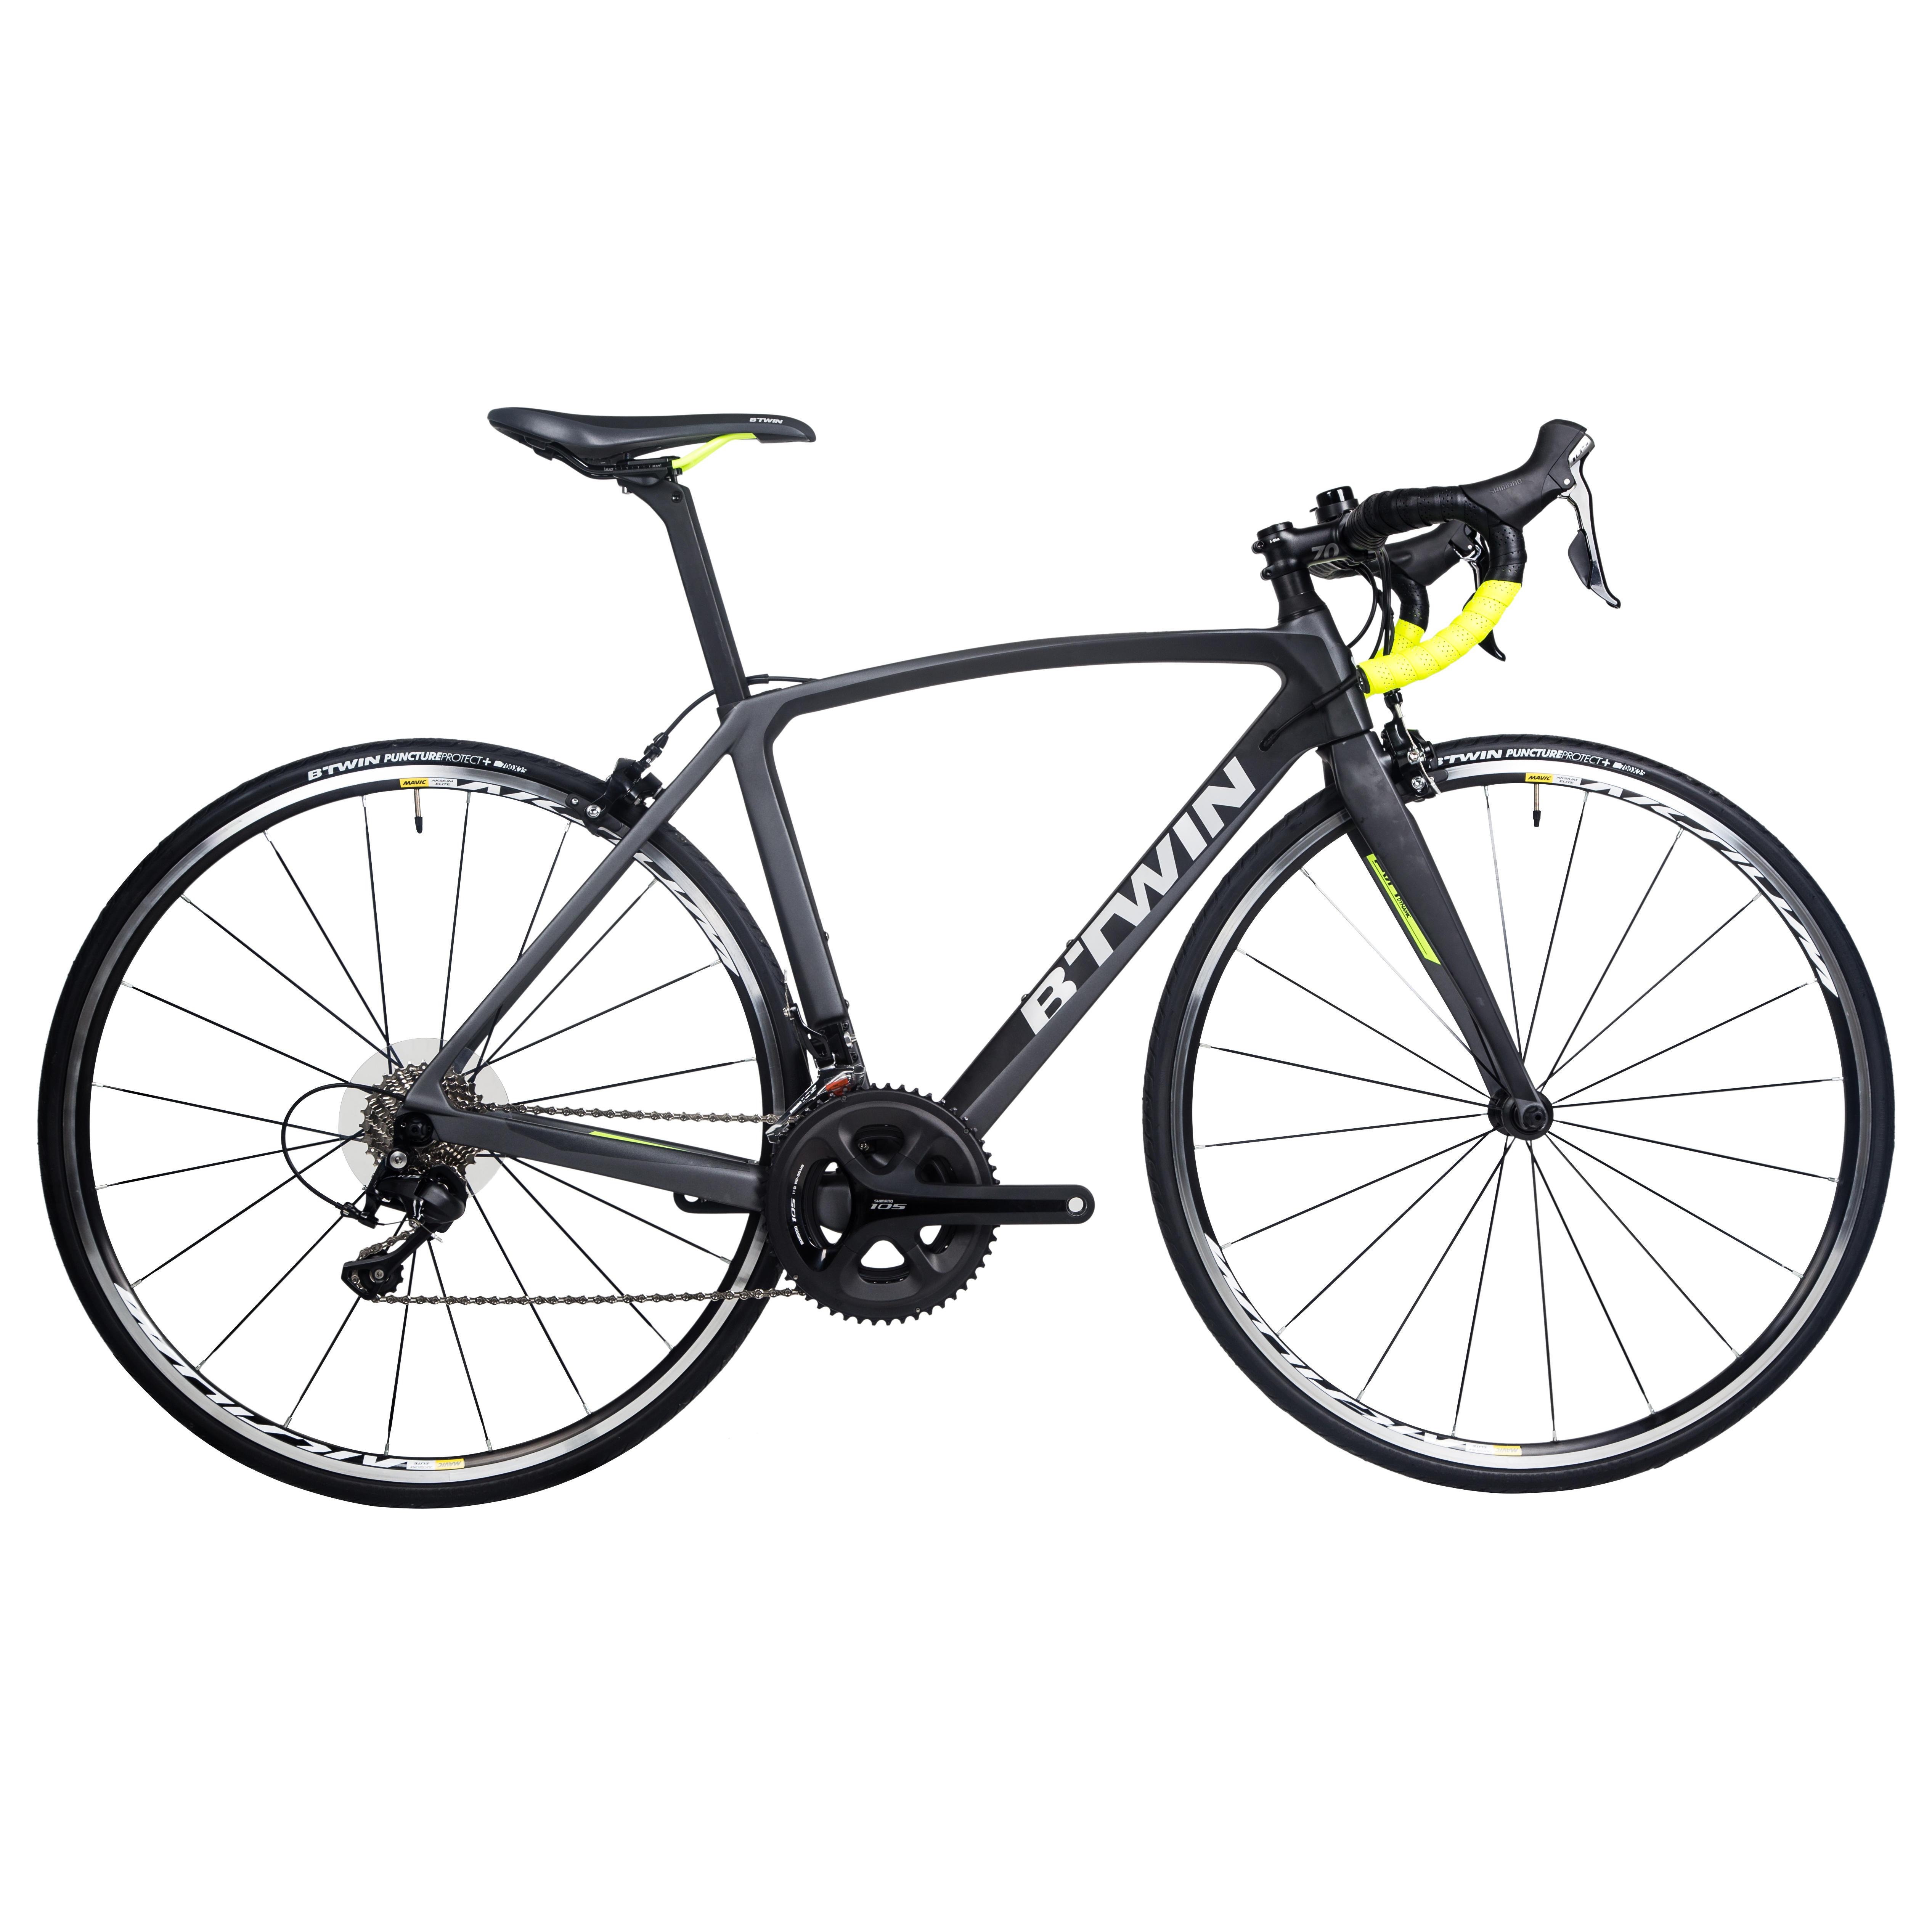 Ultra 900 Carbon Frame Road Bike